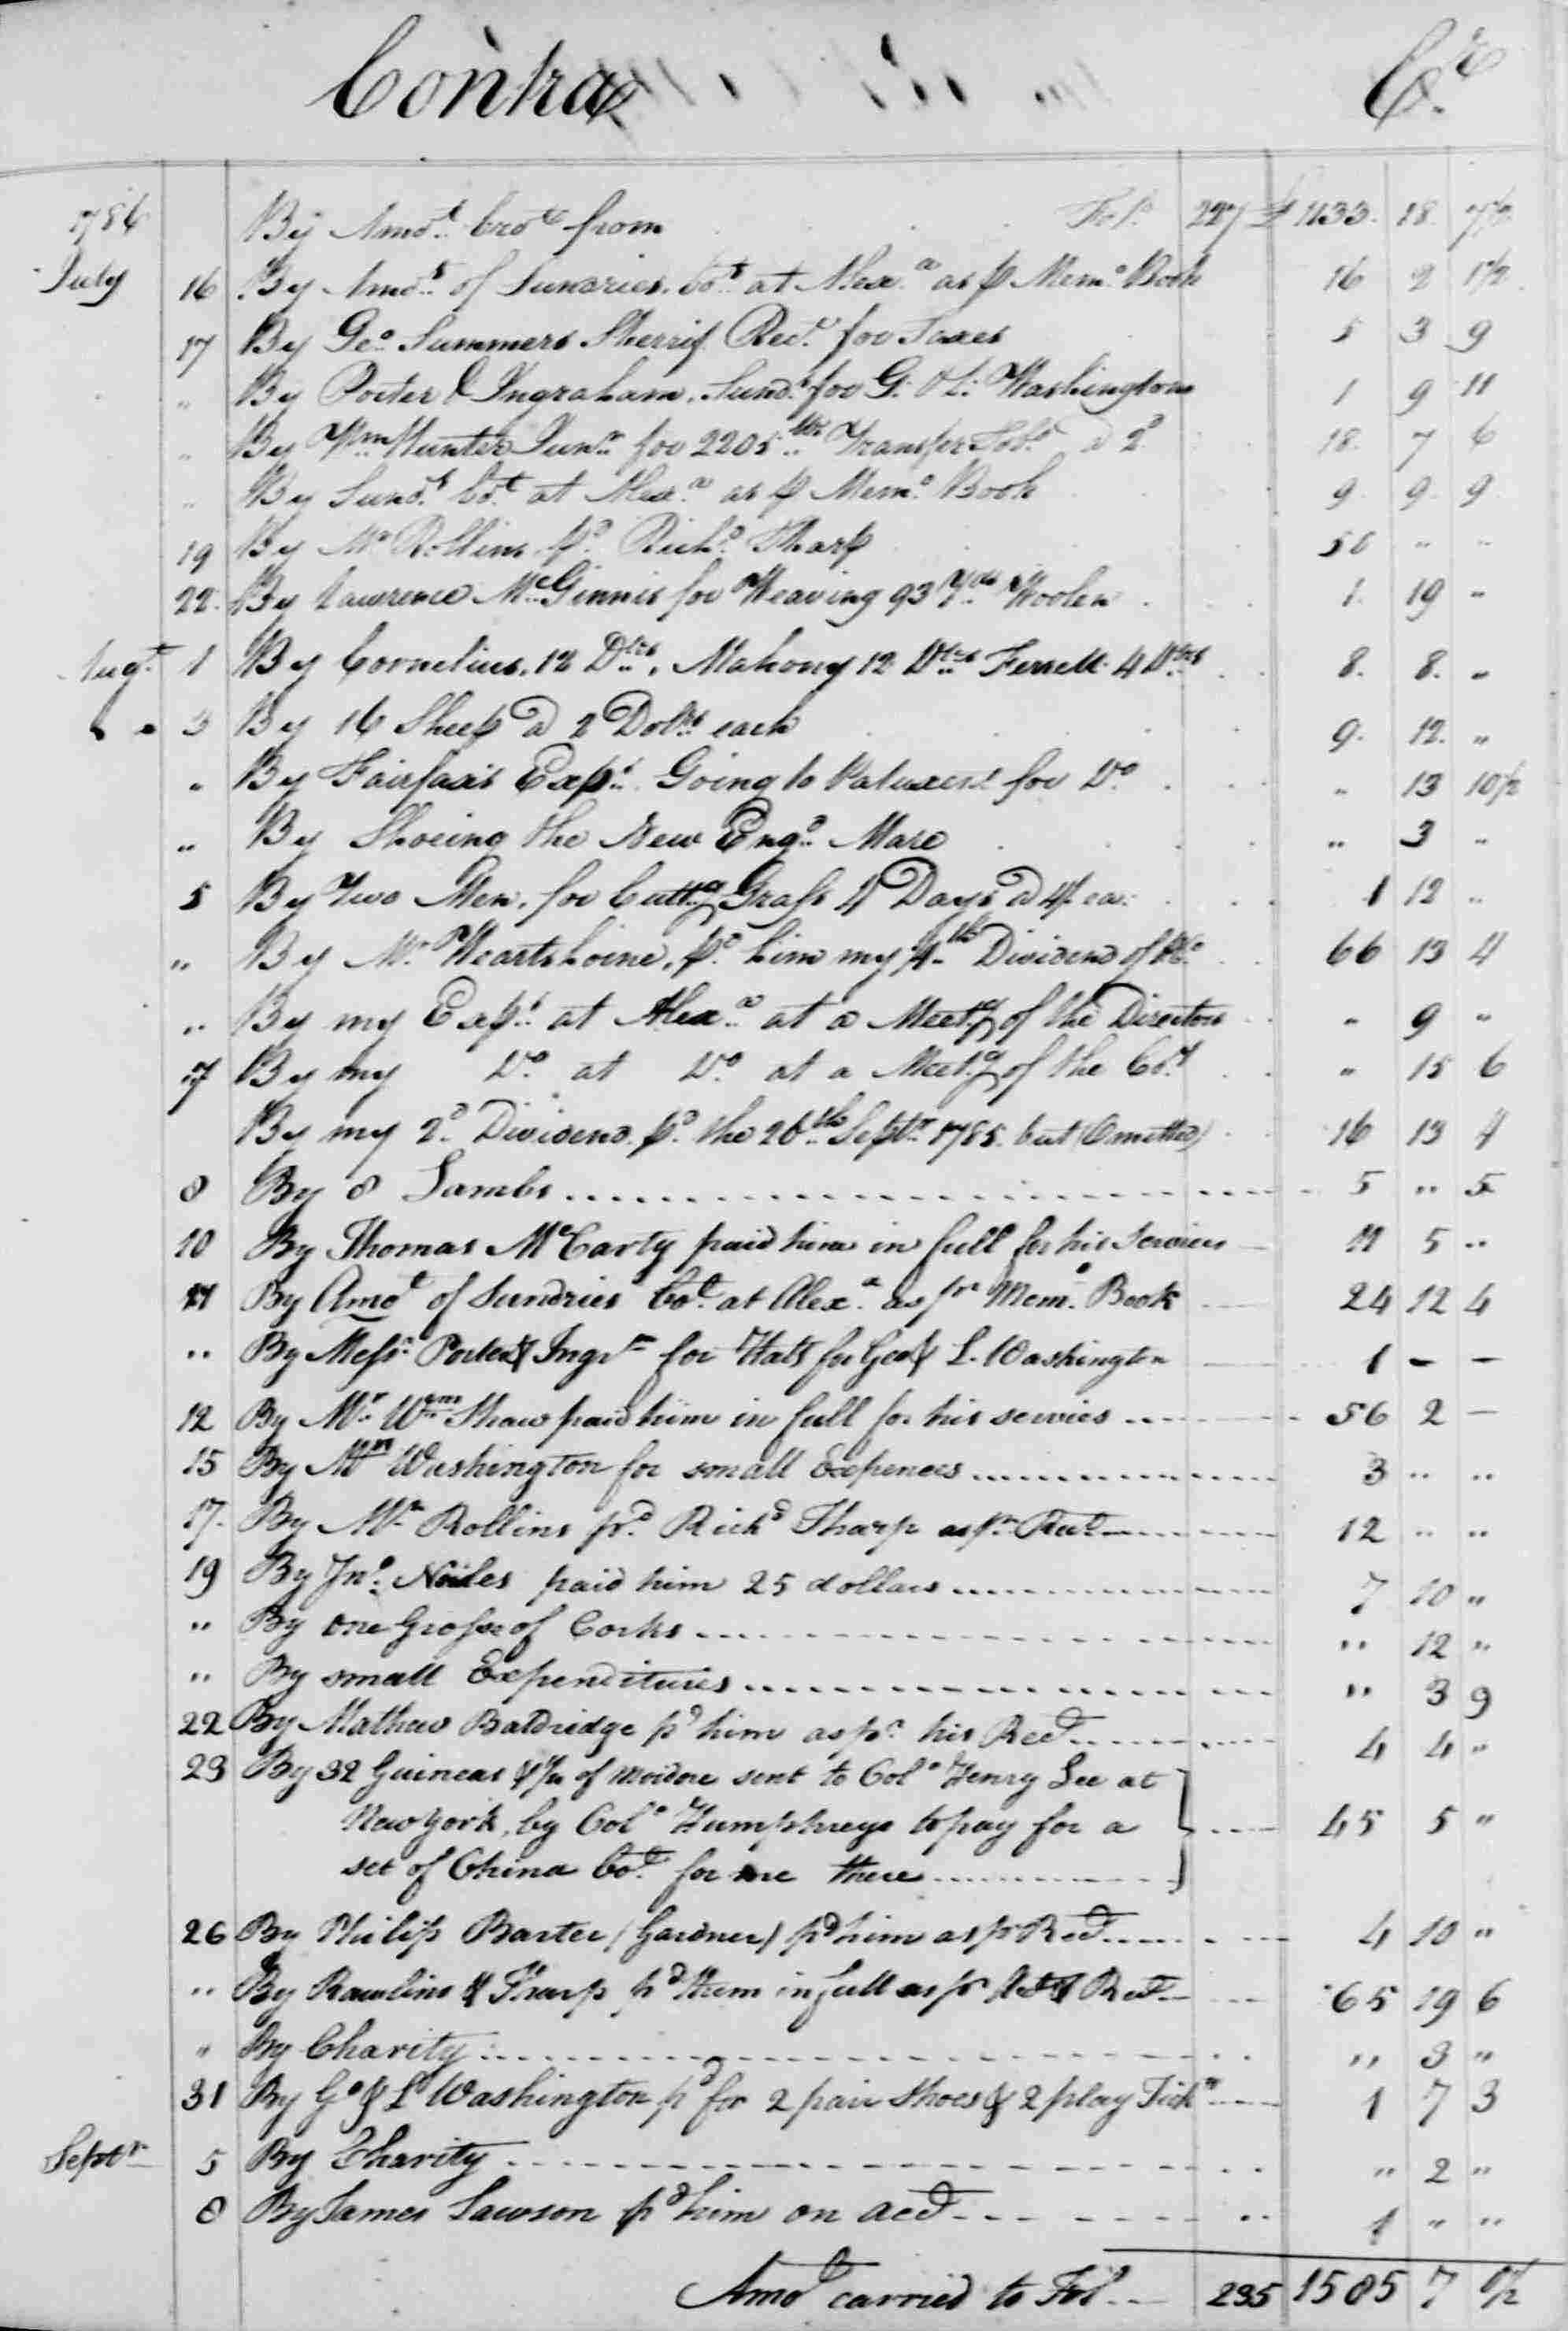 Ledger B, folio 231, right side